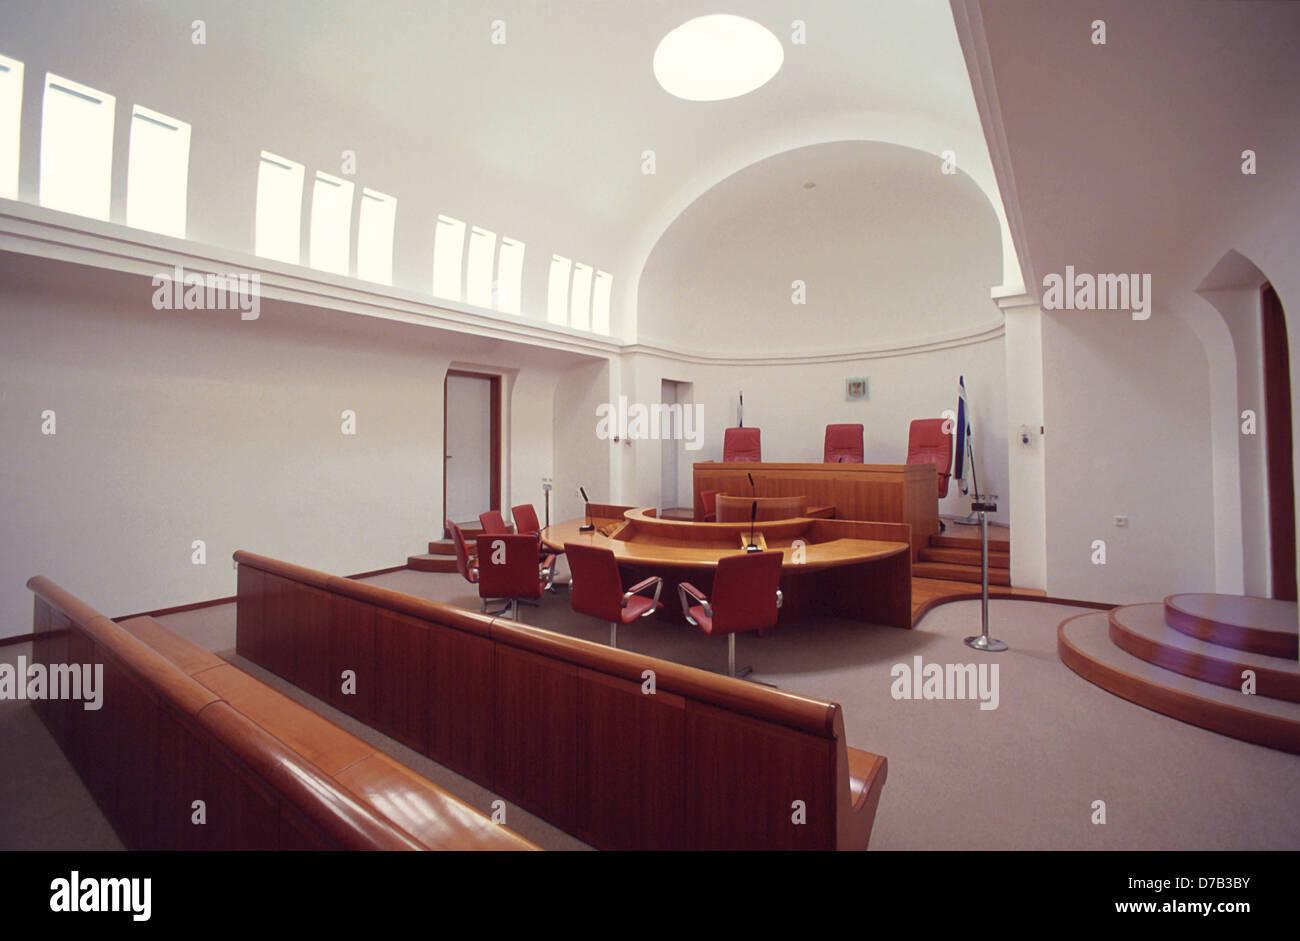 courtroom at the supreme court in jerusalem - Stock Image